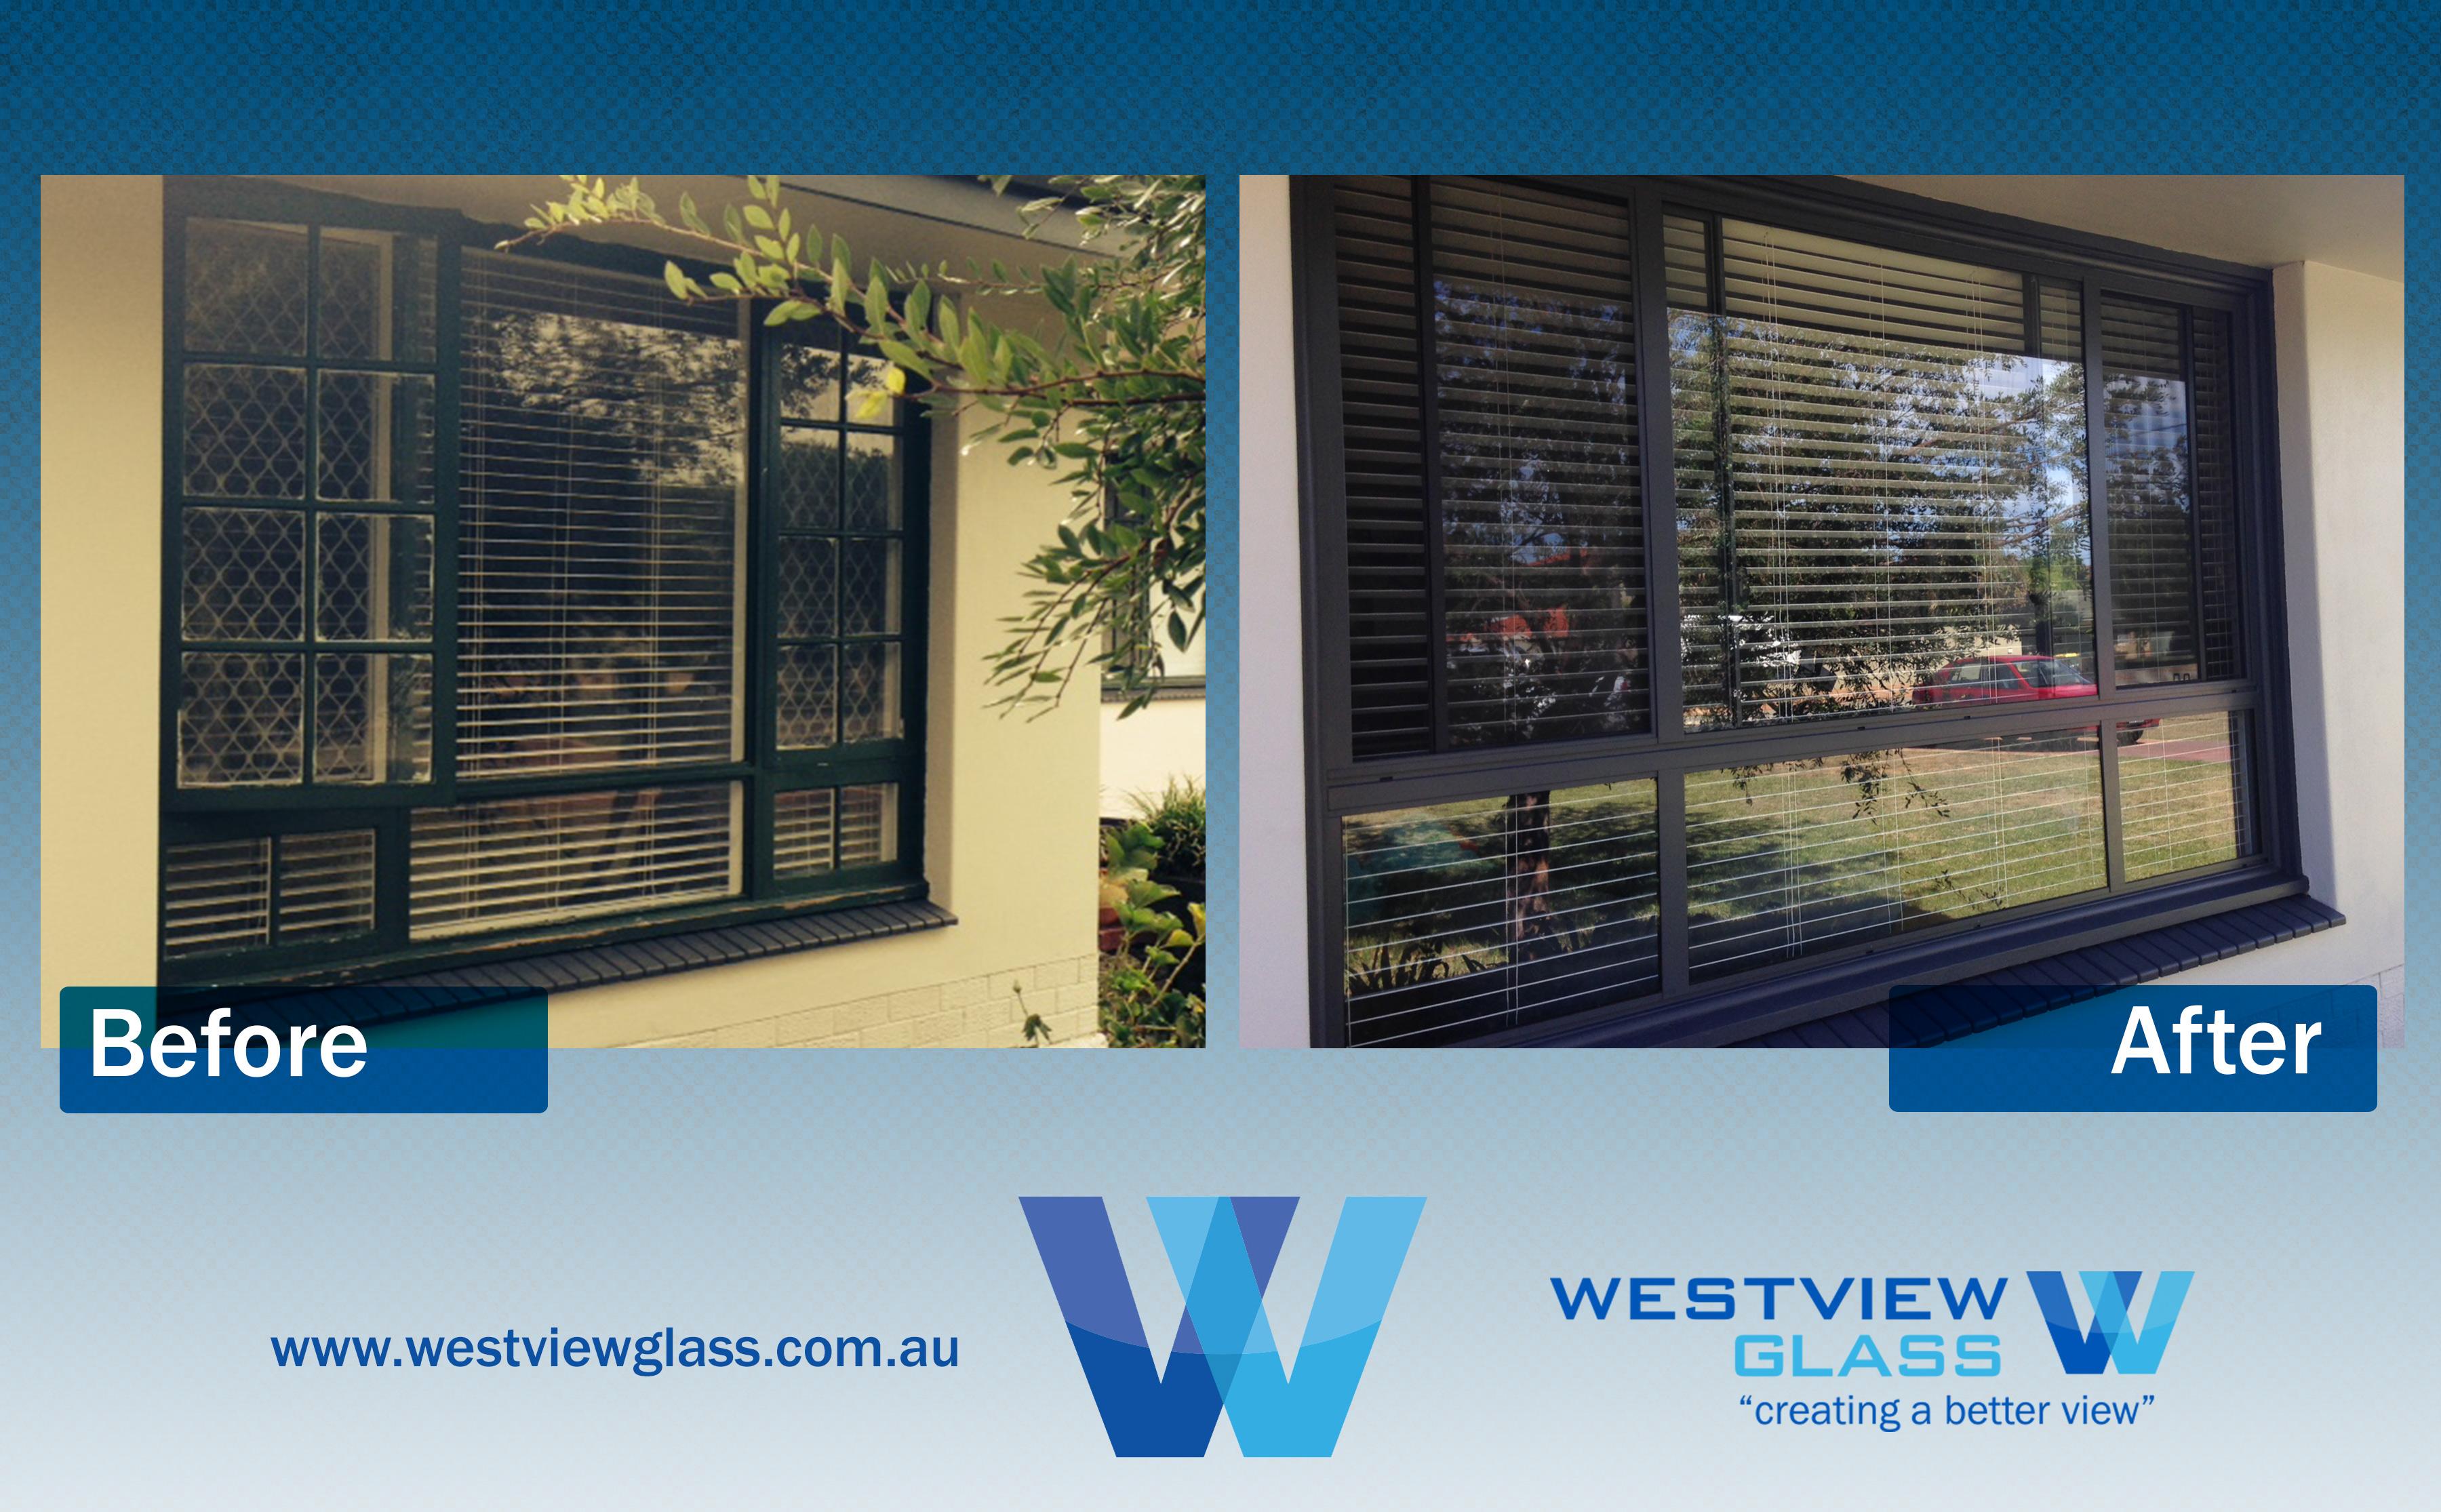 Sliding Window Timber Casement 6lite Ironestone Sliding Window - Aluminium Window Gallery – Before & After